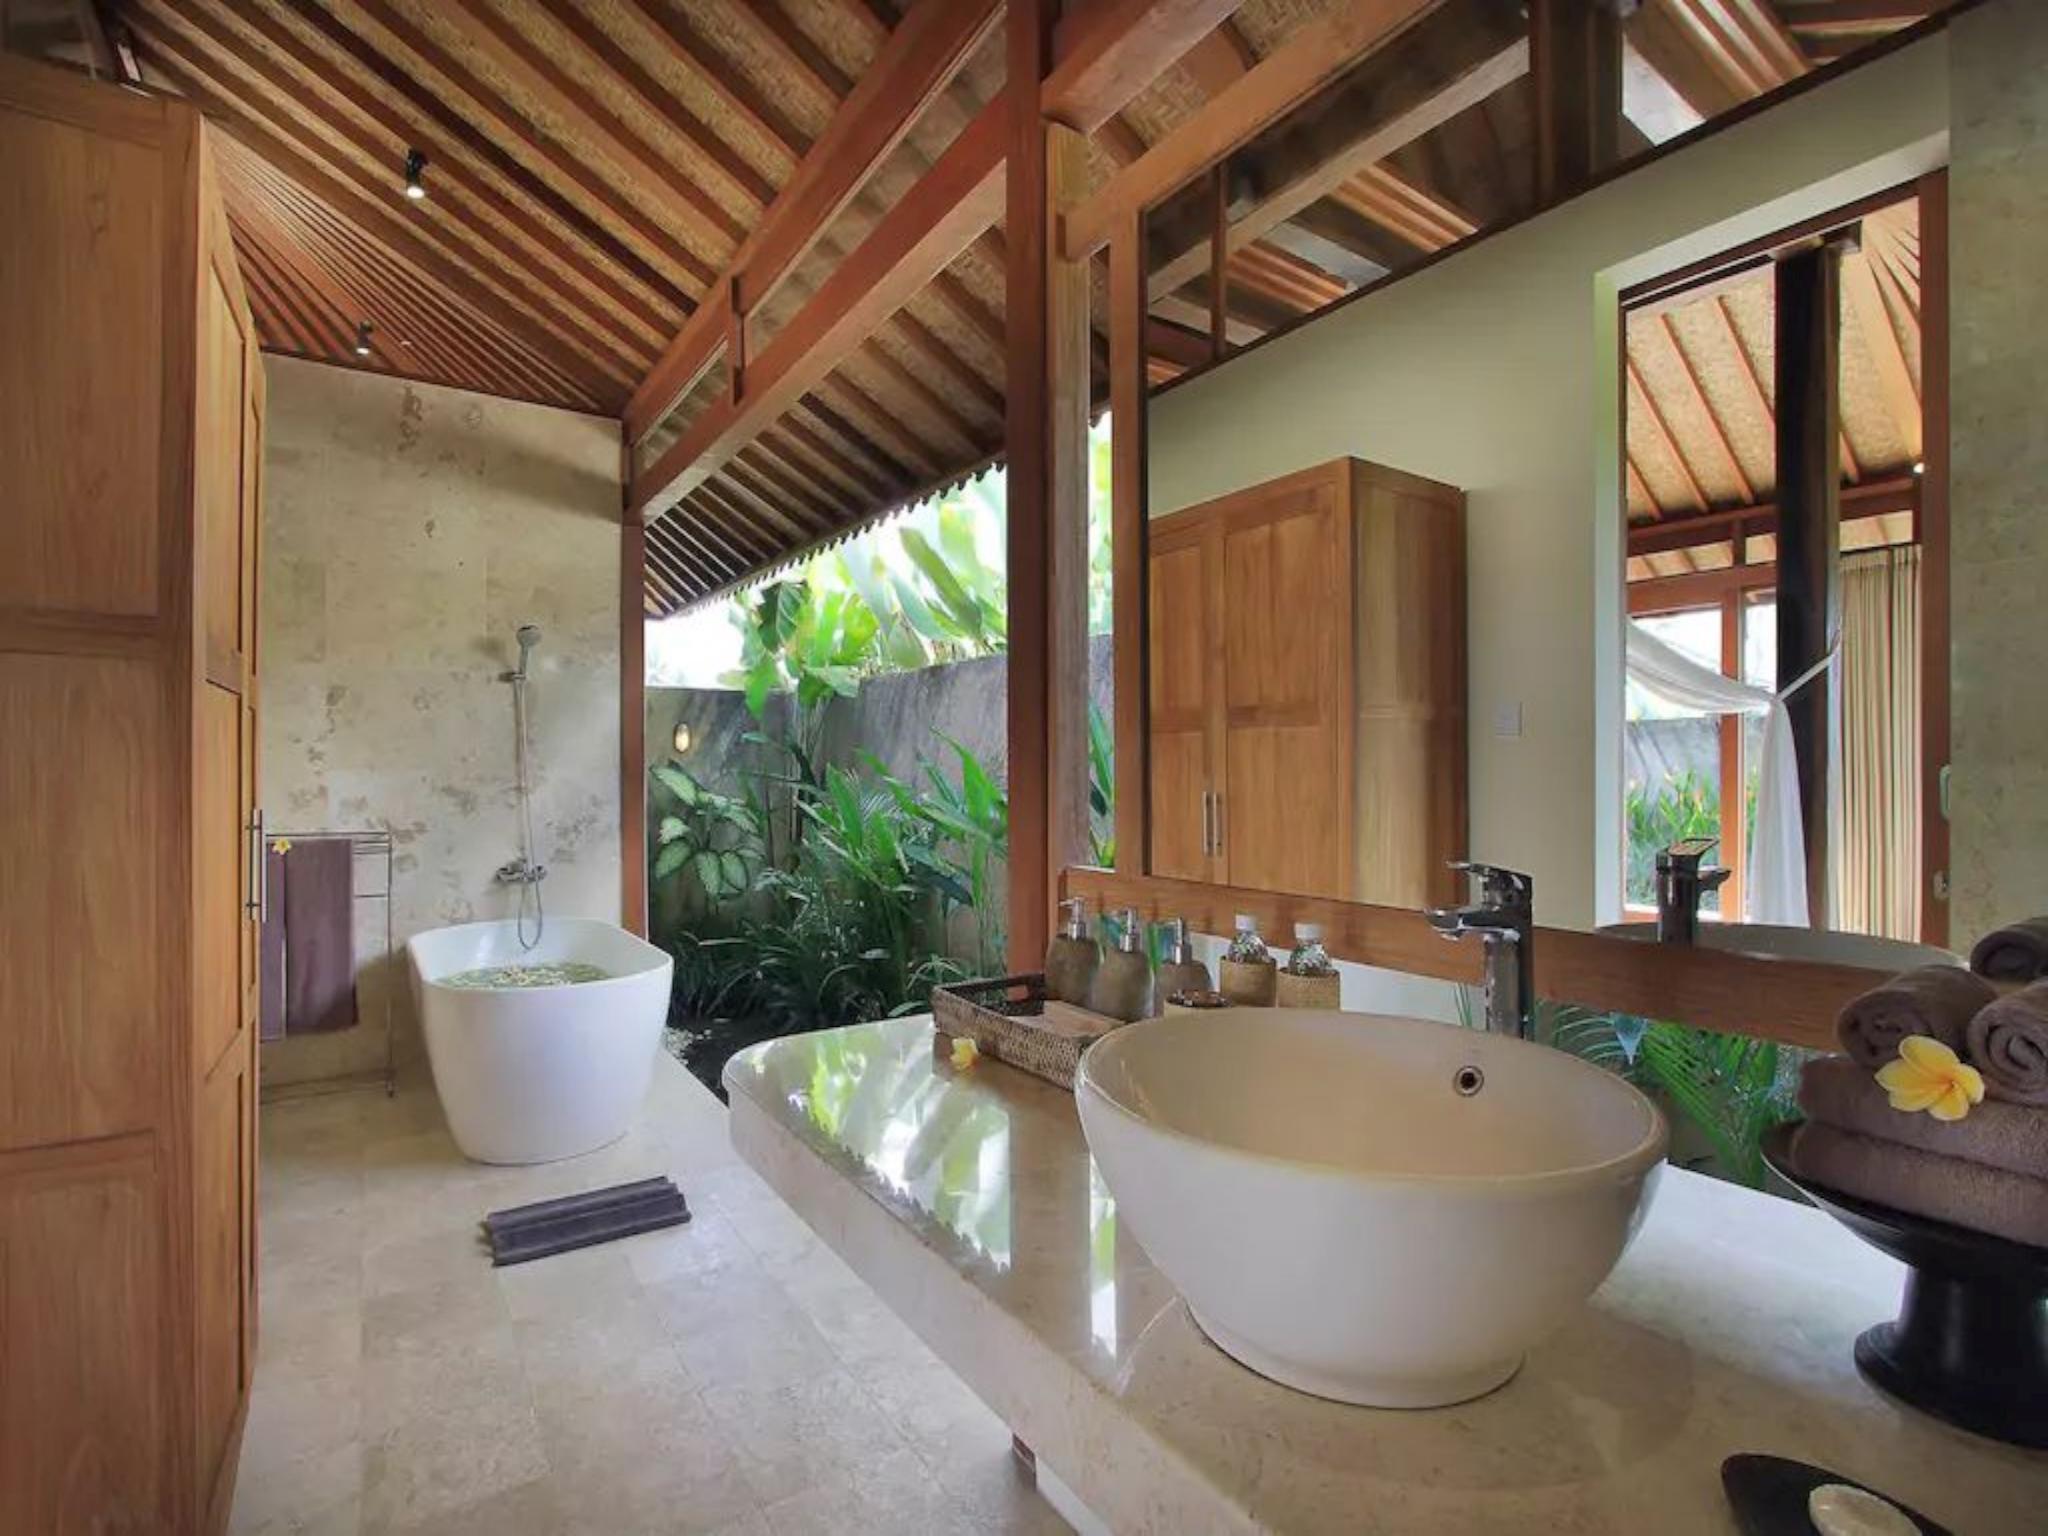 Kabinawa Private Villa With Rice Paddy View